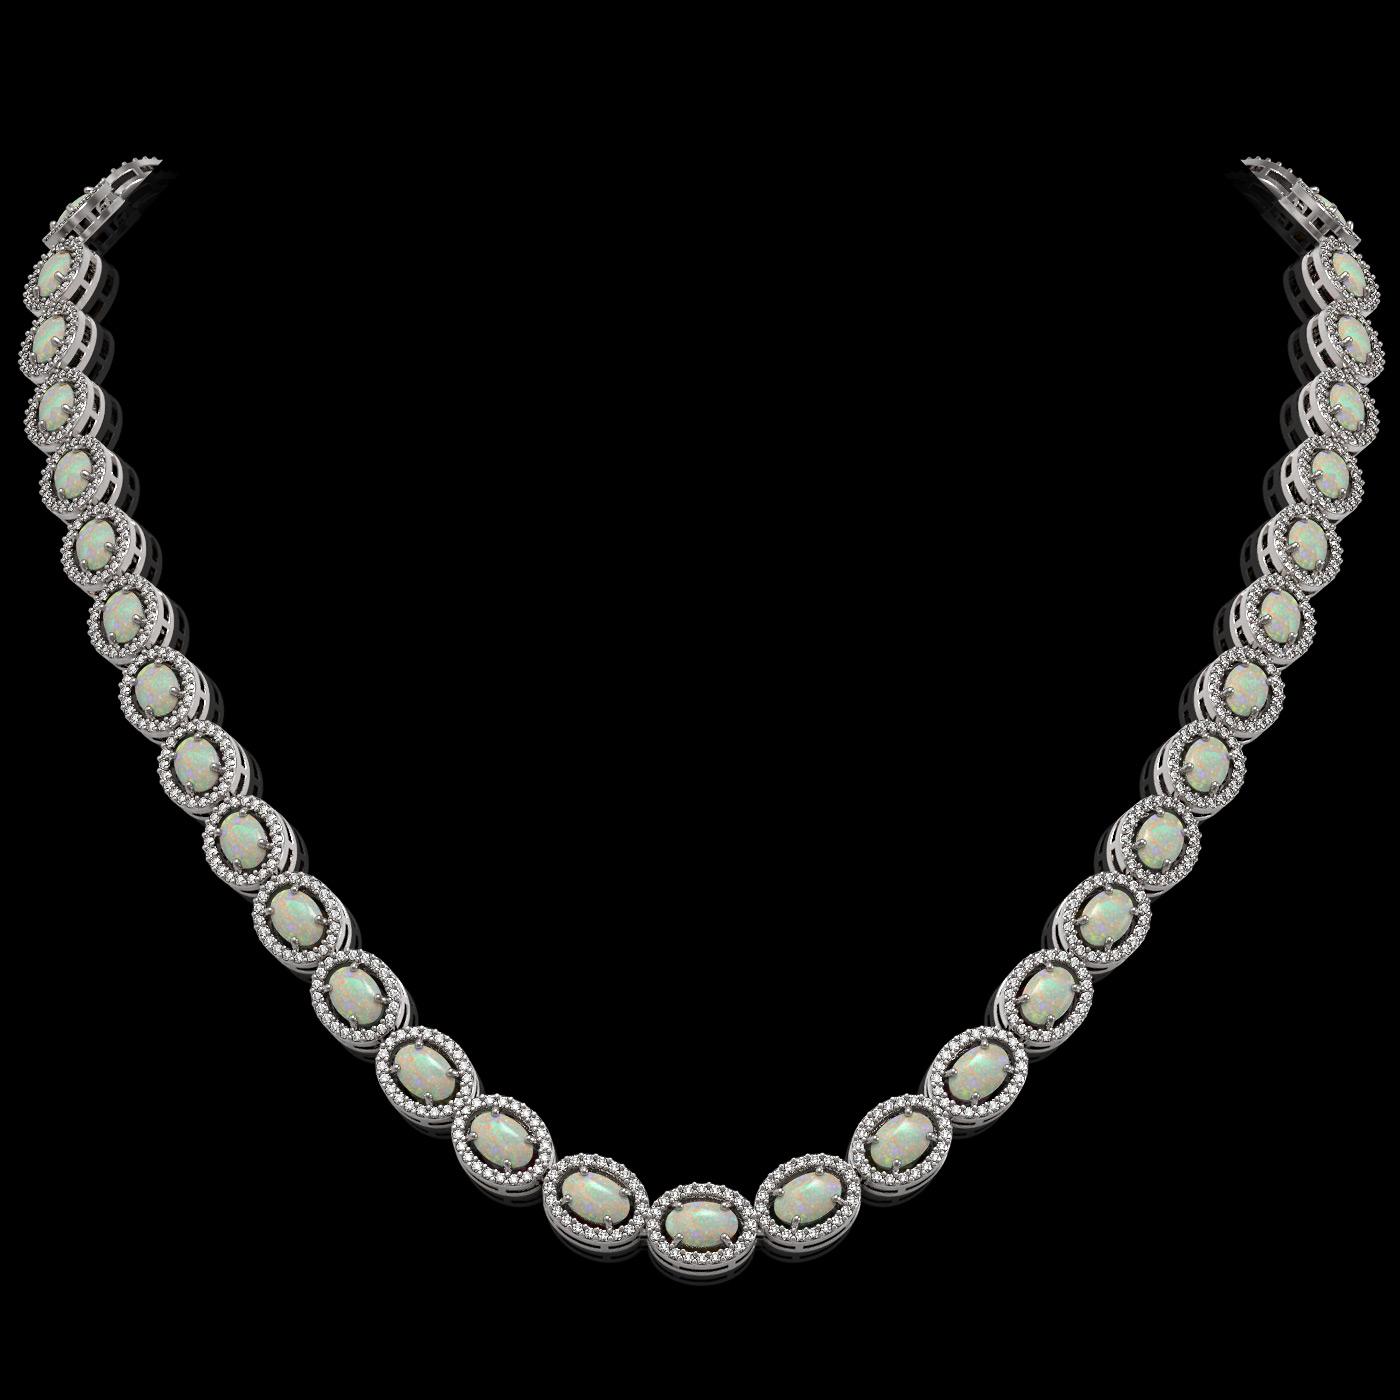 21.21 Ctw Opal & Diamond Necklace White Gold